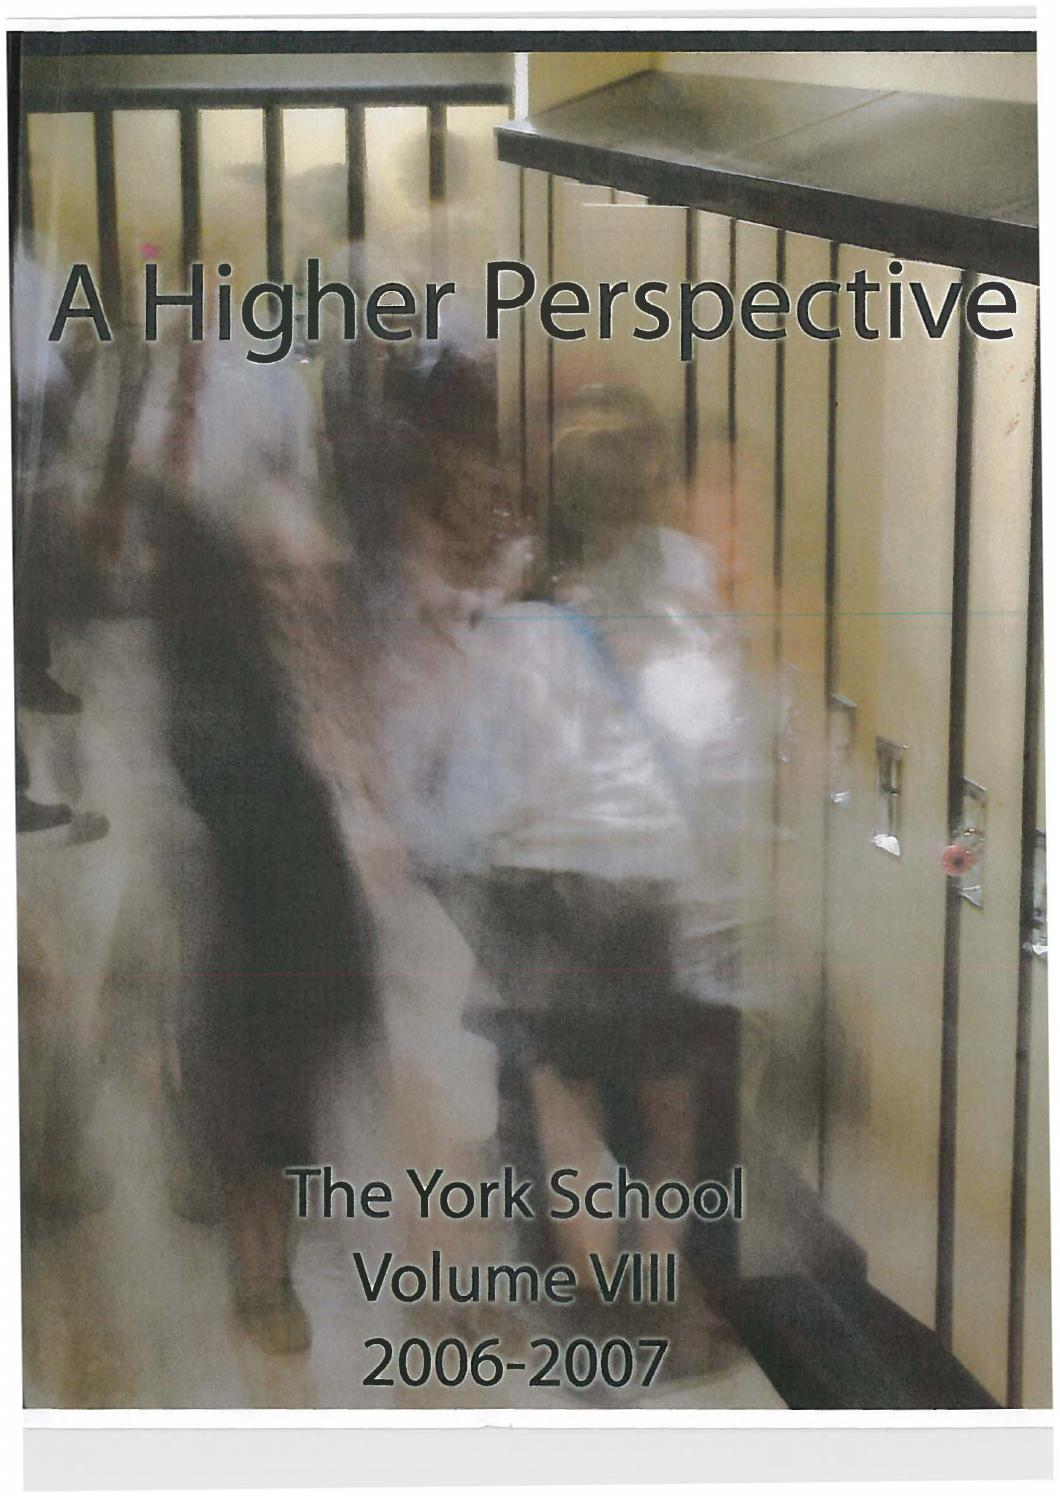 Nuria Lewinsky 2006- 2007 a higher perspectivethe york school - issuu